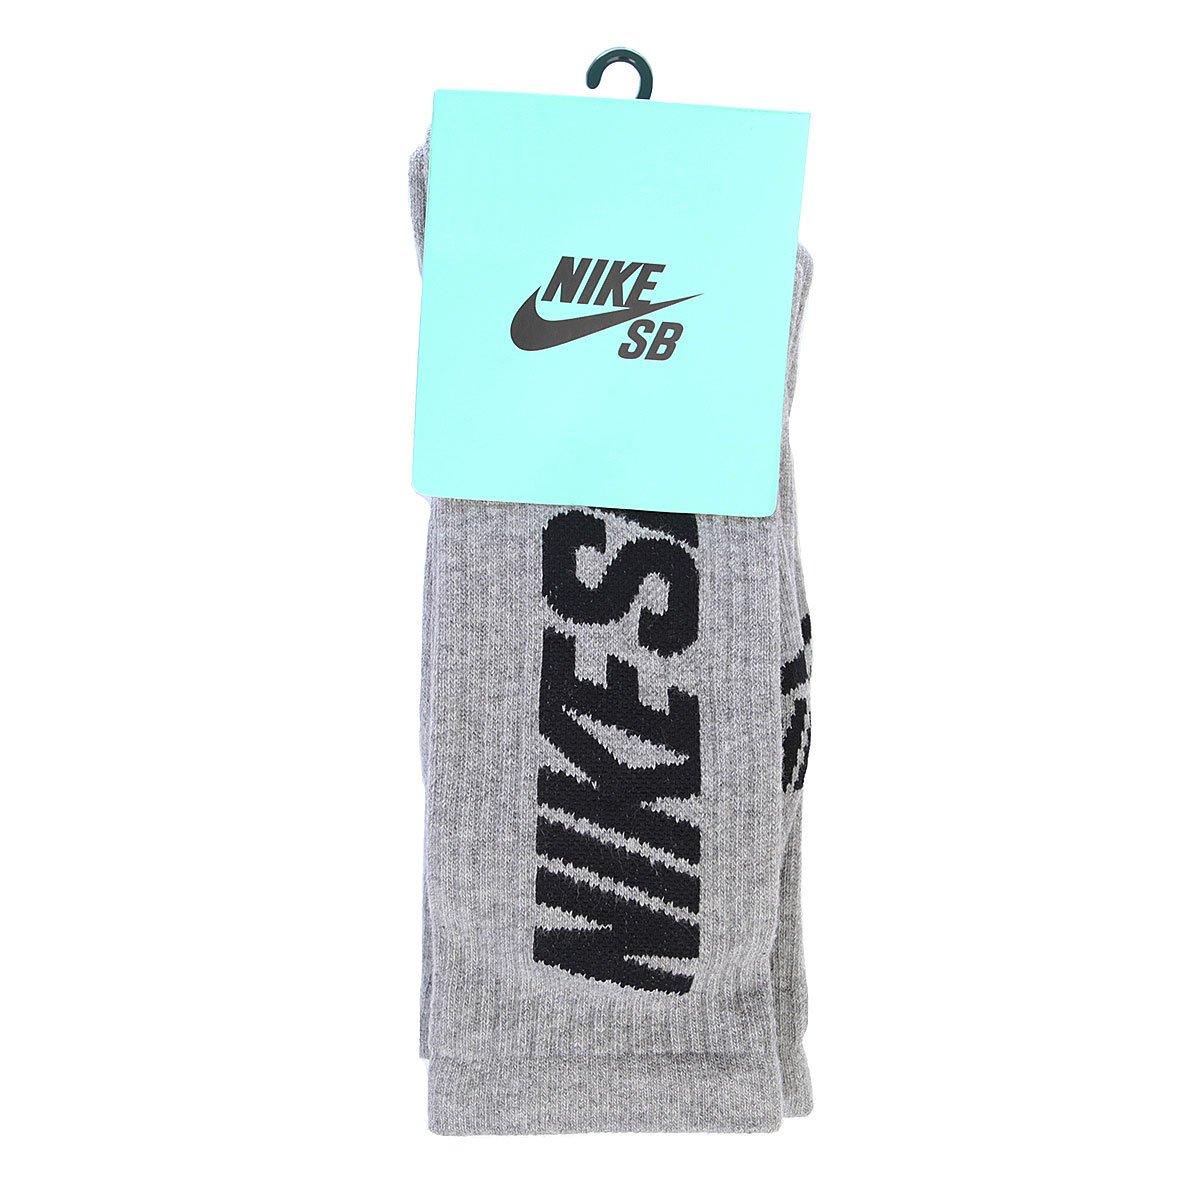 7fe882a7d39a8 Носки средние унисекс Nike Sb 3 Pack Crew Socks Dark Grey/Heather Black